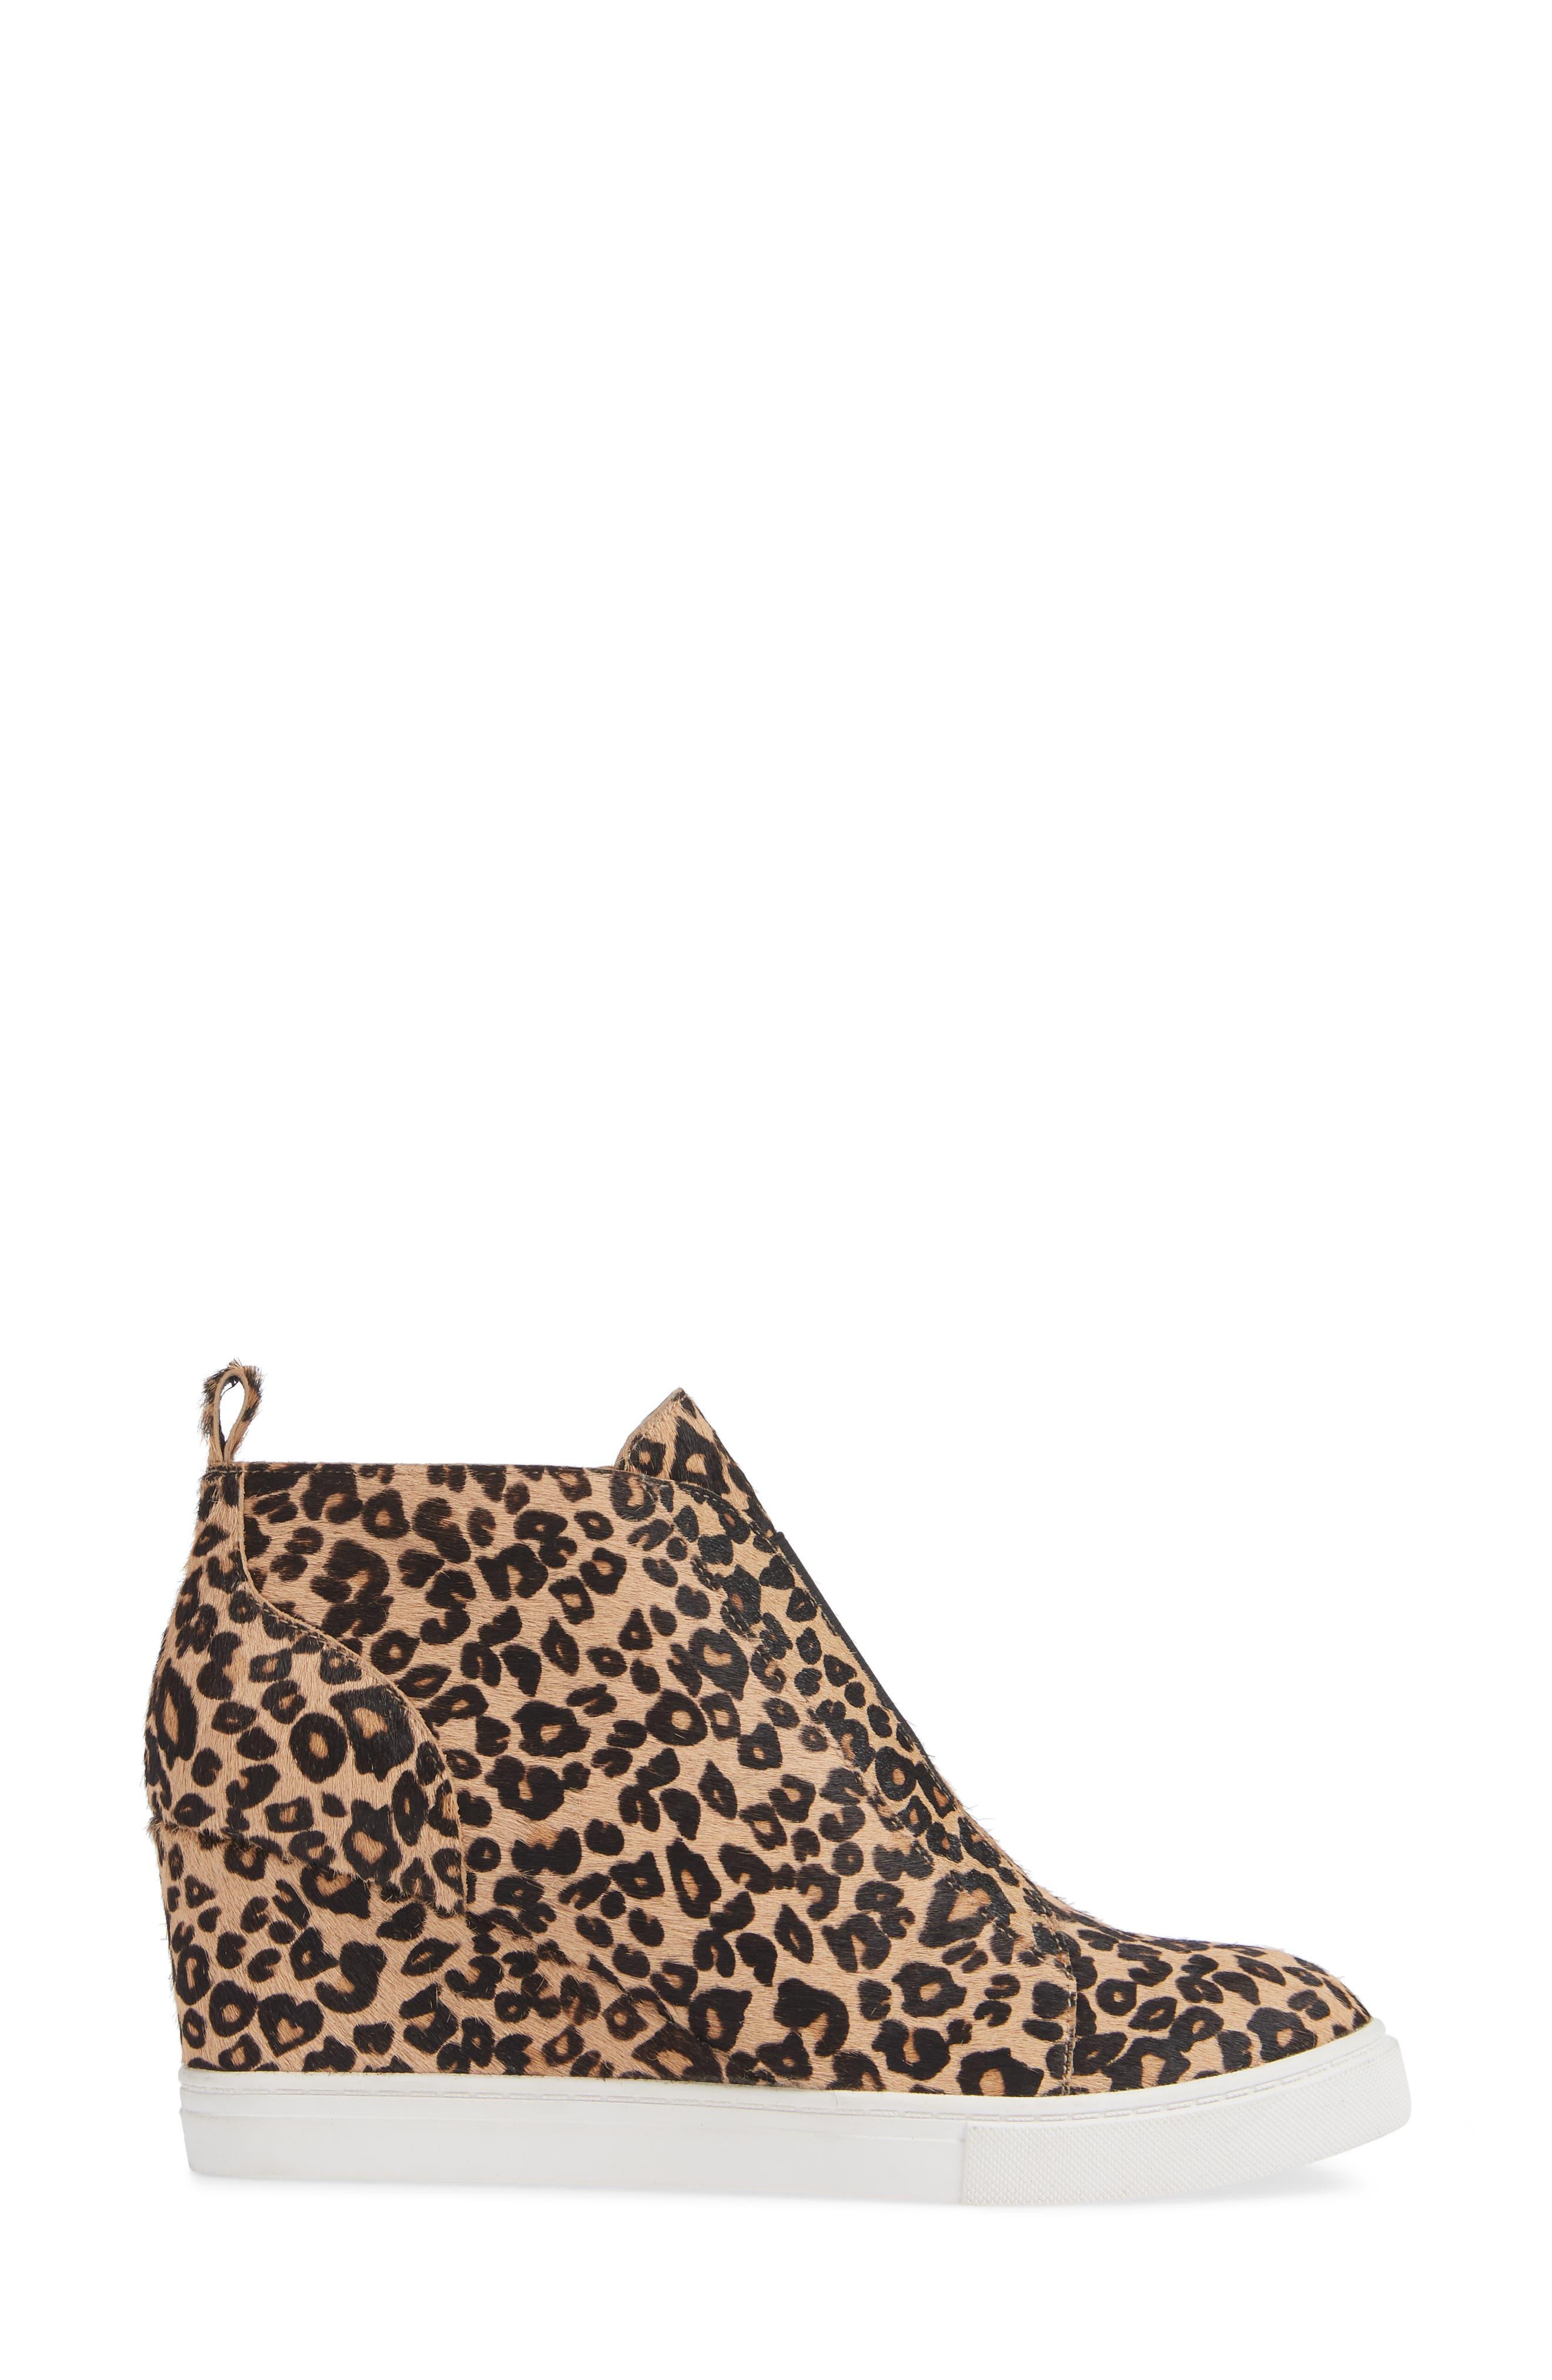 Felicia III Genuine Calf Hair Wedge Sneaker,                             Alternate thumbnail 3, color,                             LEOPARD PRINT HAIR CALF